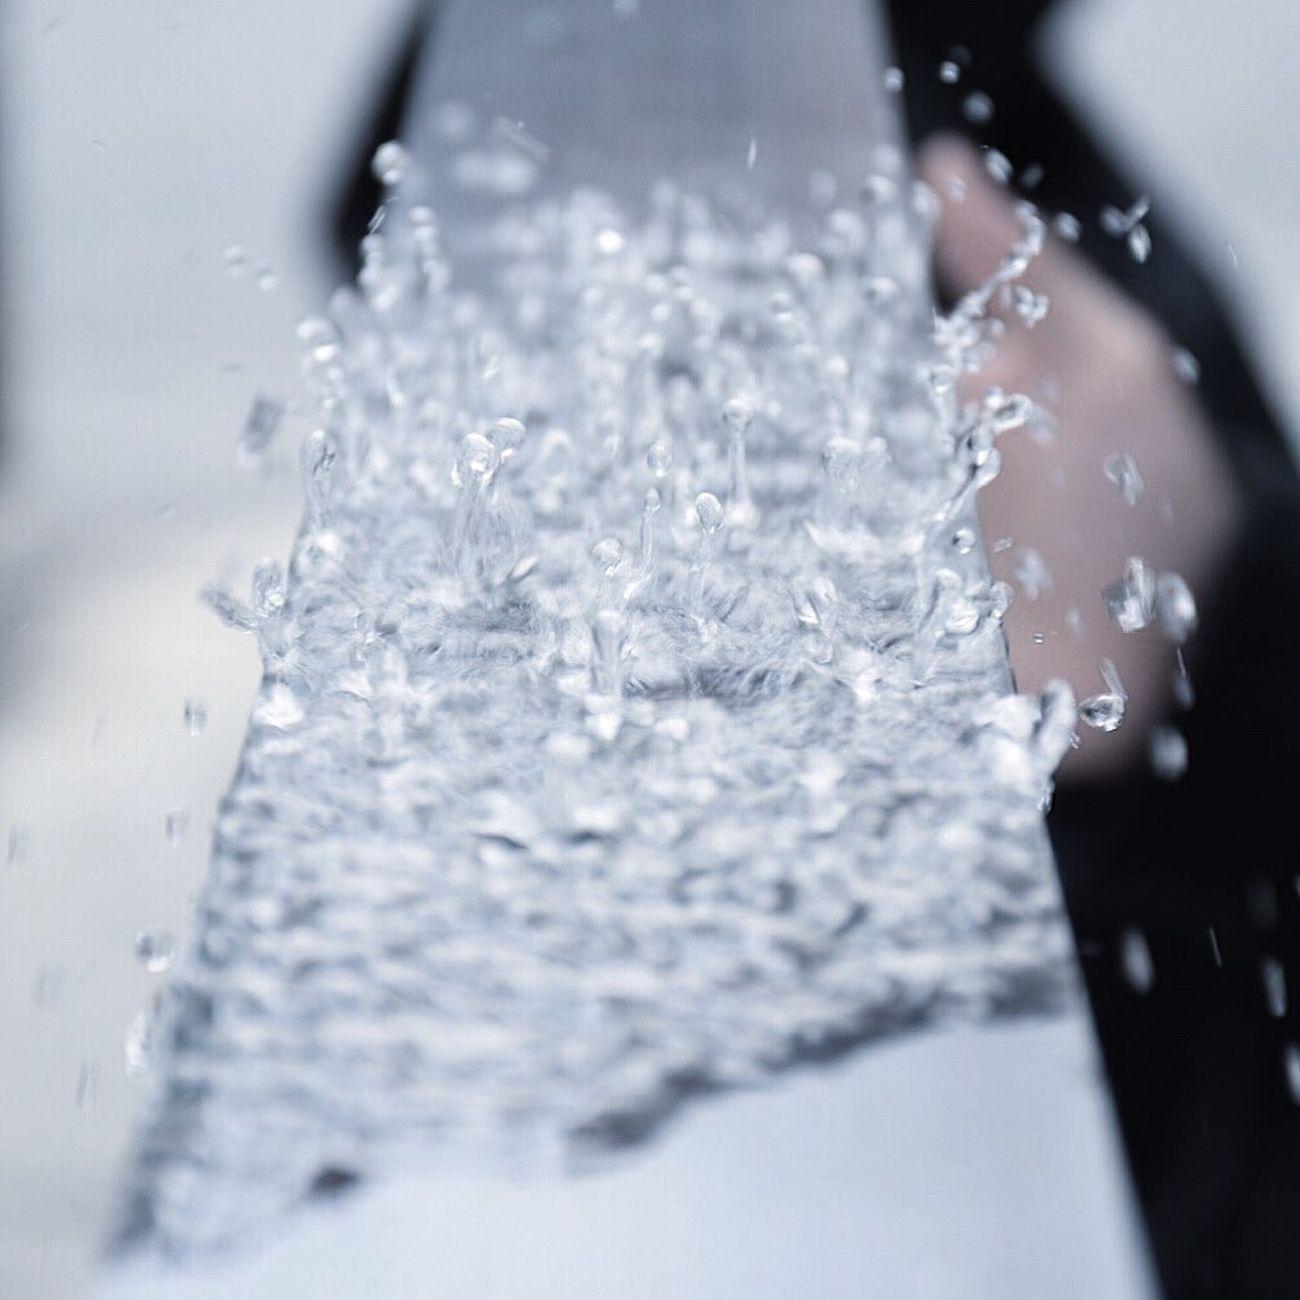 Rain Rainy Days Water Drop Vibration